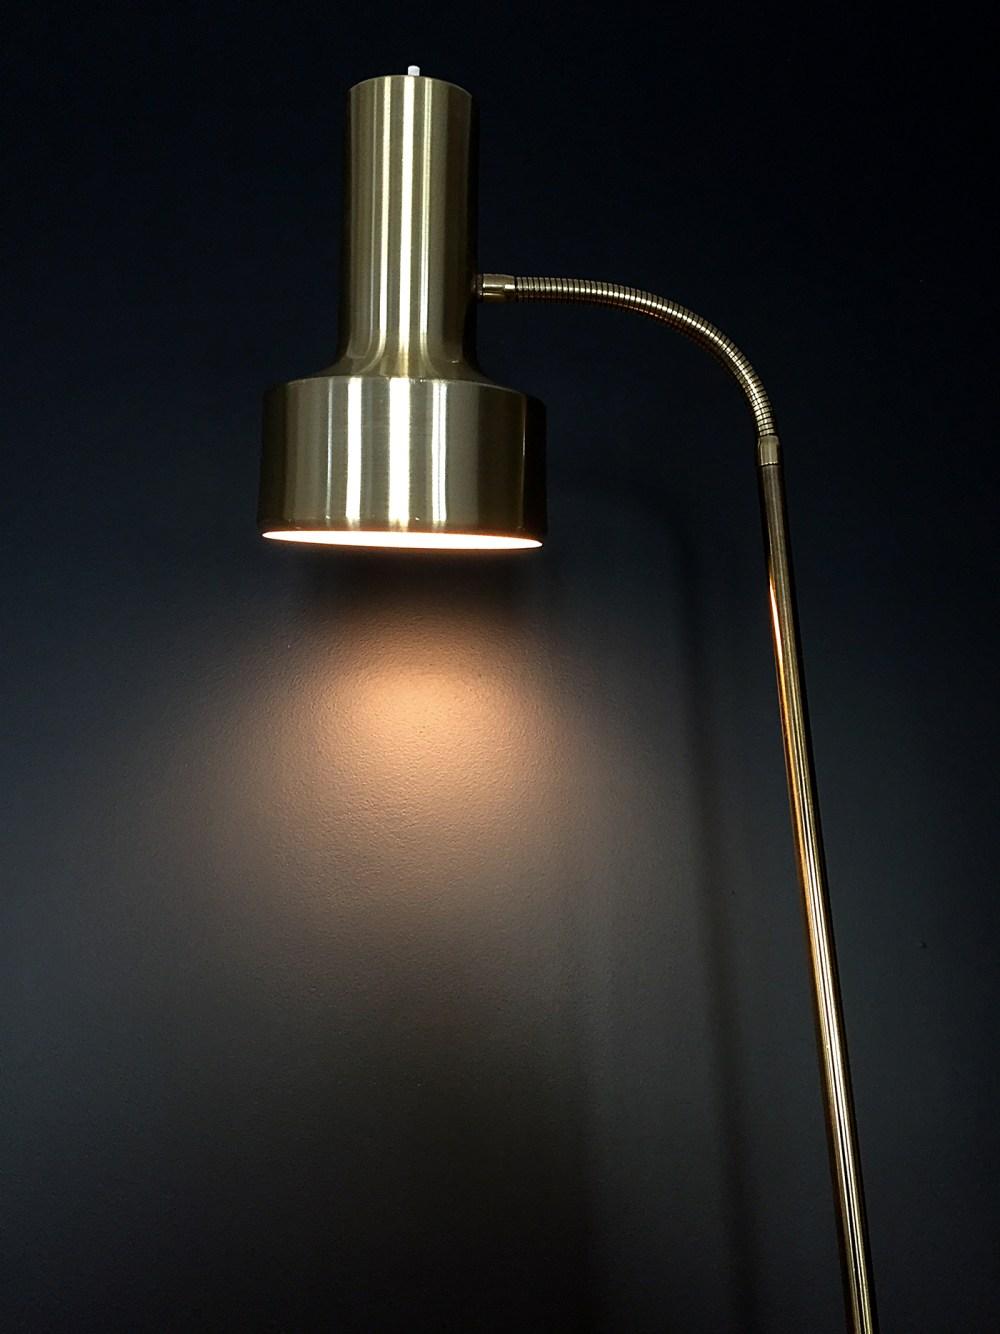 Dansa lampe. lampadaire scandinave vintage laiton